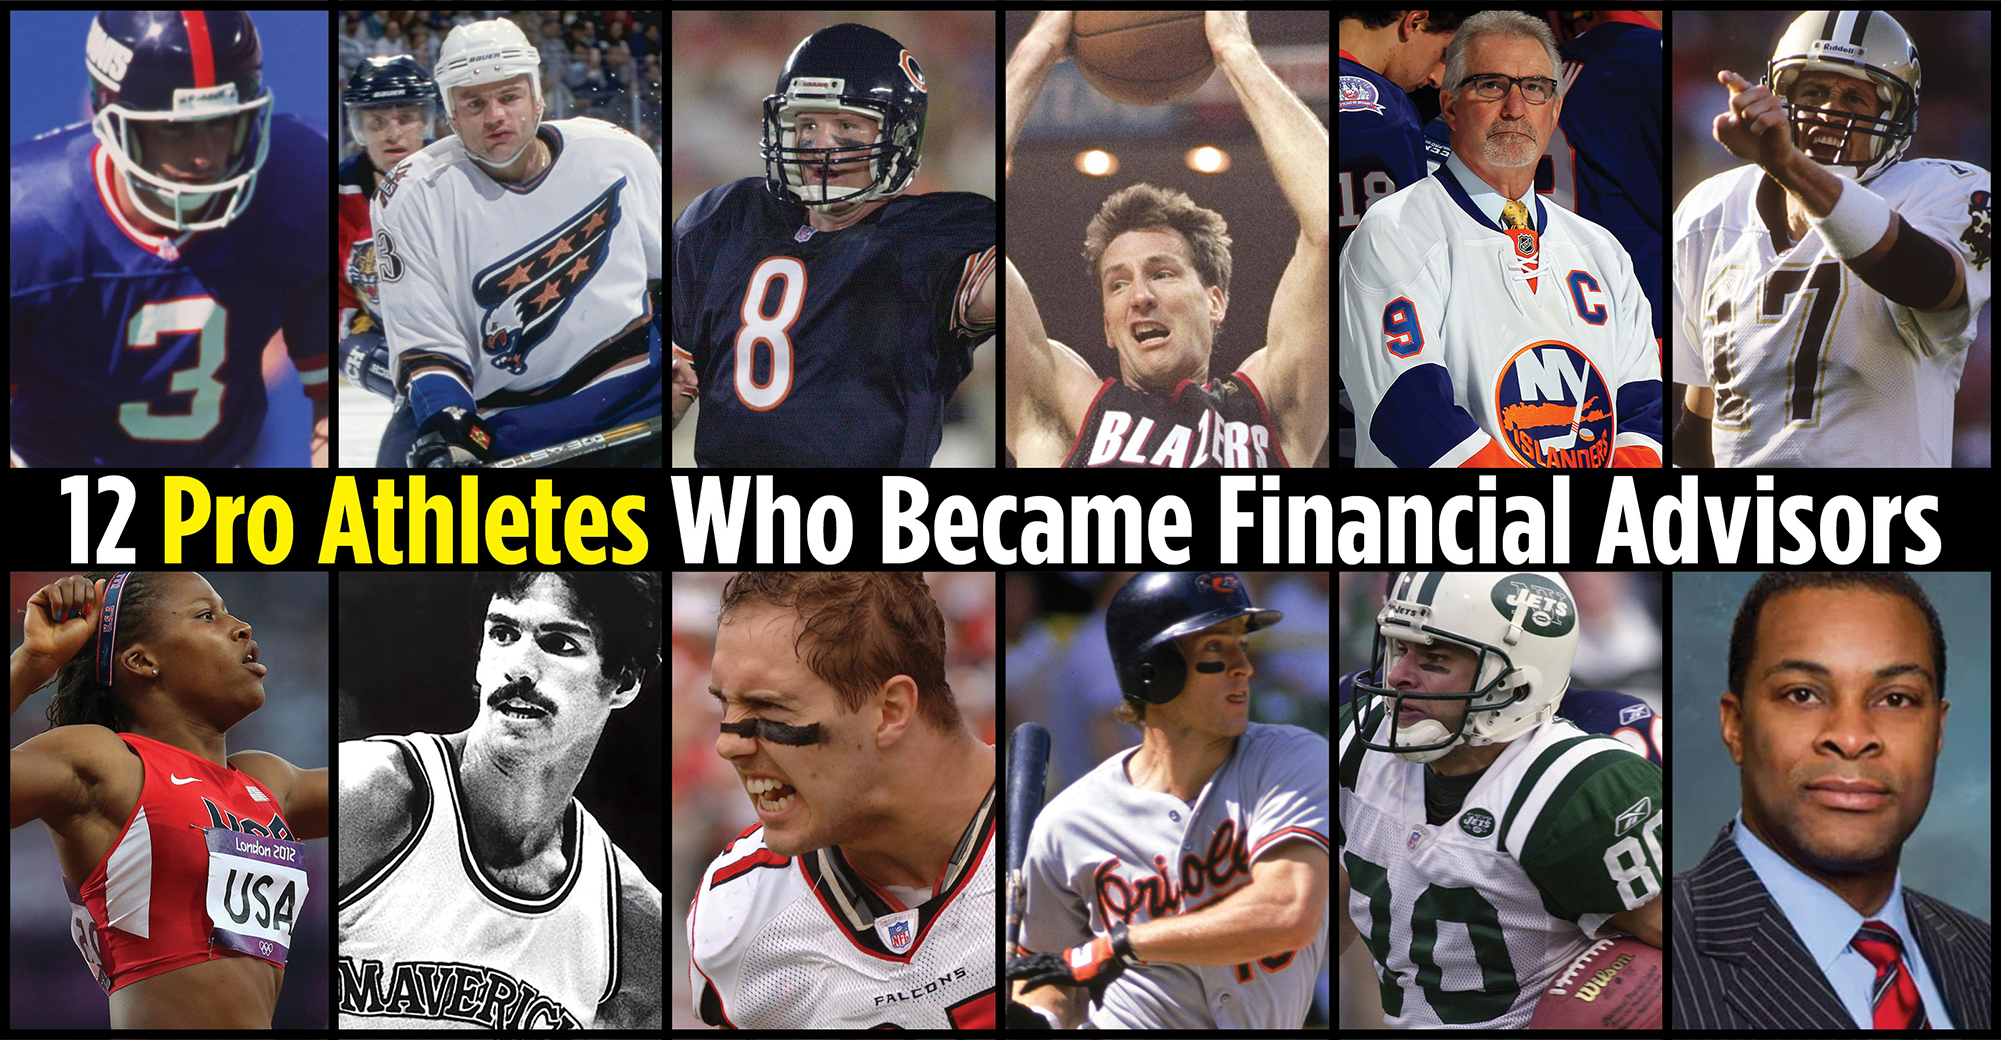 Chris Dudley, Wayne Chrebet, Jim Everett: Athletes Who